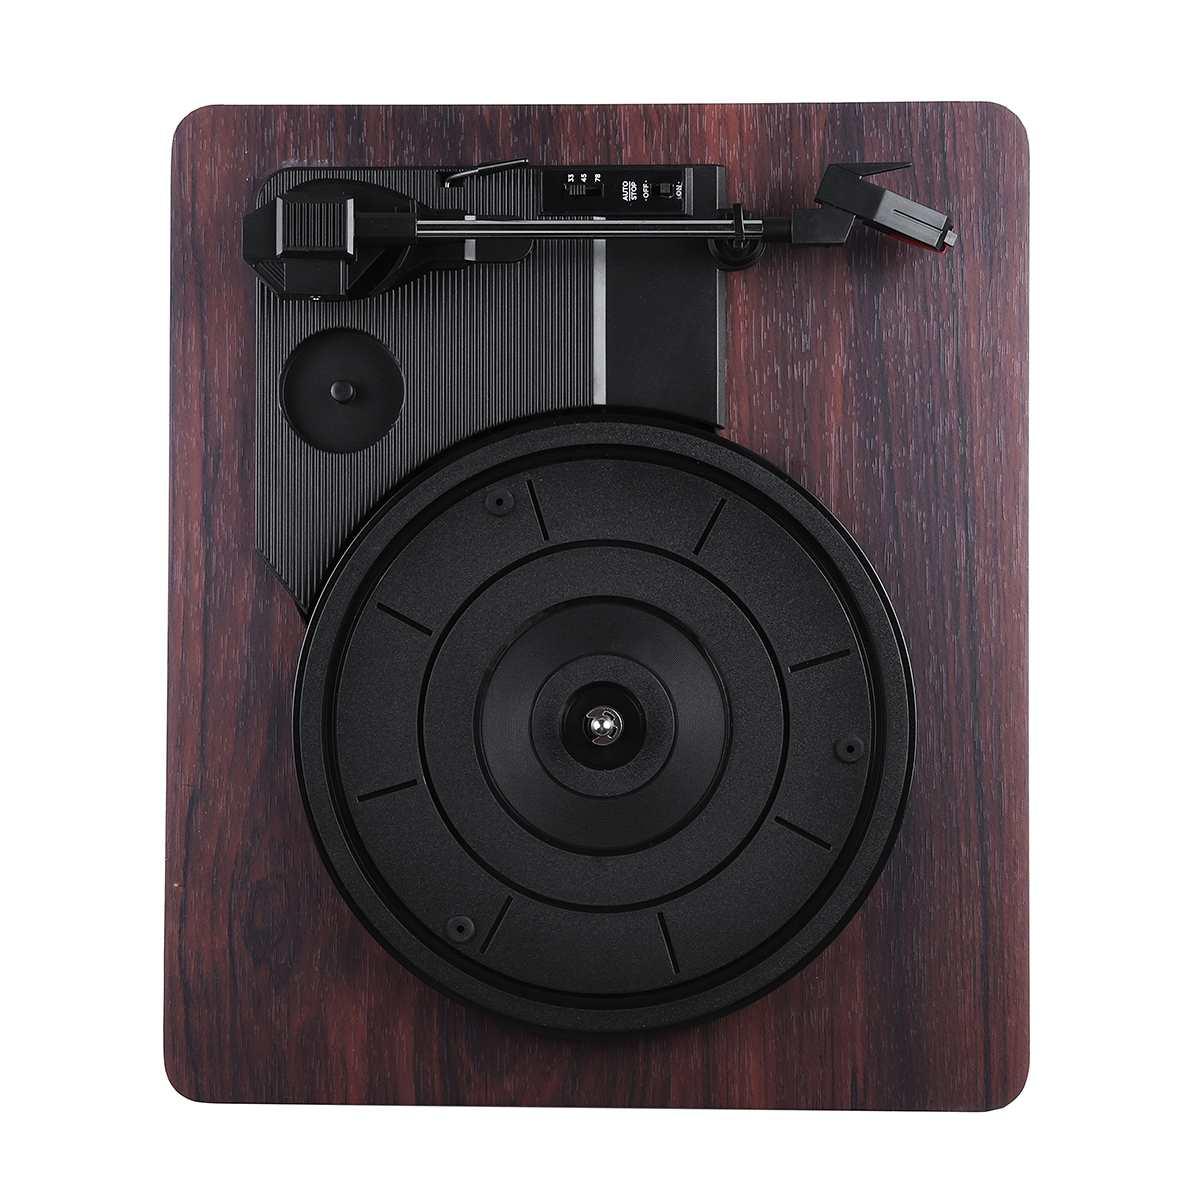 33 78 Rpm Rekord Lp Spieler Pvc Antikes Grammophon Plattenspieler Disc Vinyl Audio Rca R/l 3,5mm Ausgang Out Usb Warmes Lob Von Kunden Zu Gewinnen 45